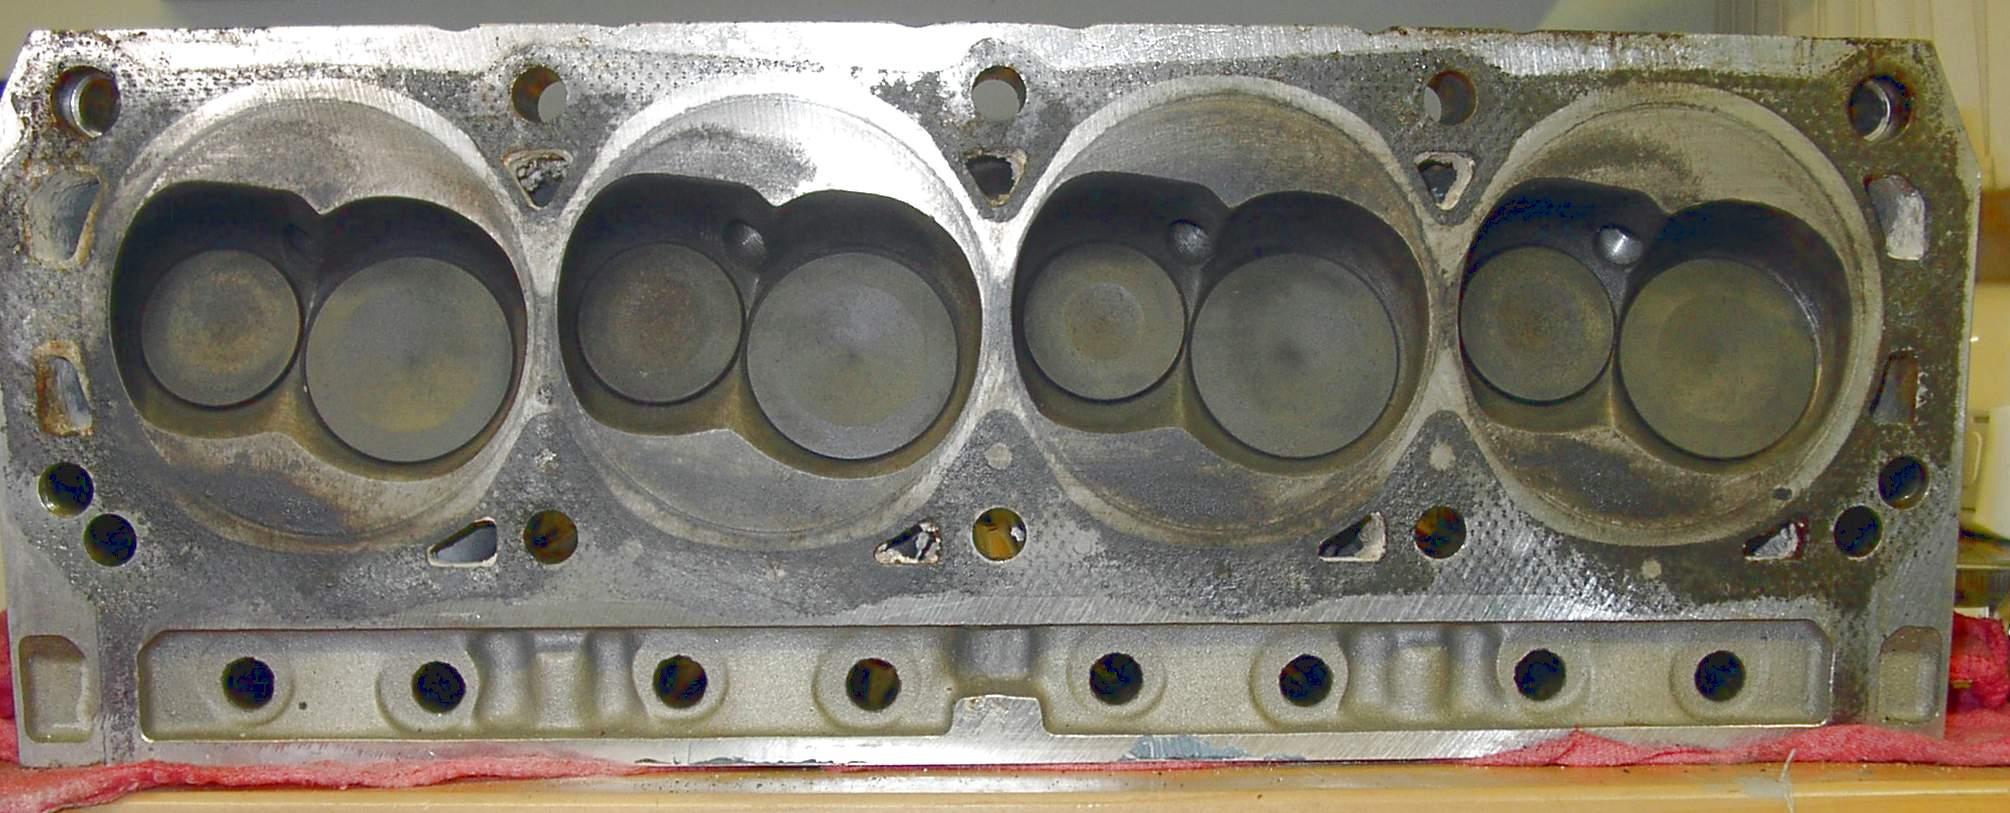 Click image for larger version  Name:number 3928 passanger side cylinder head.JPG Views:42 Size:212.3 KB ID:191424